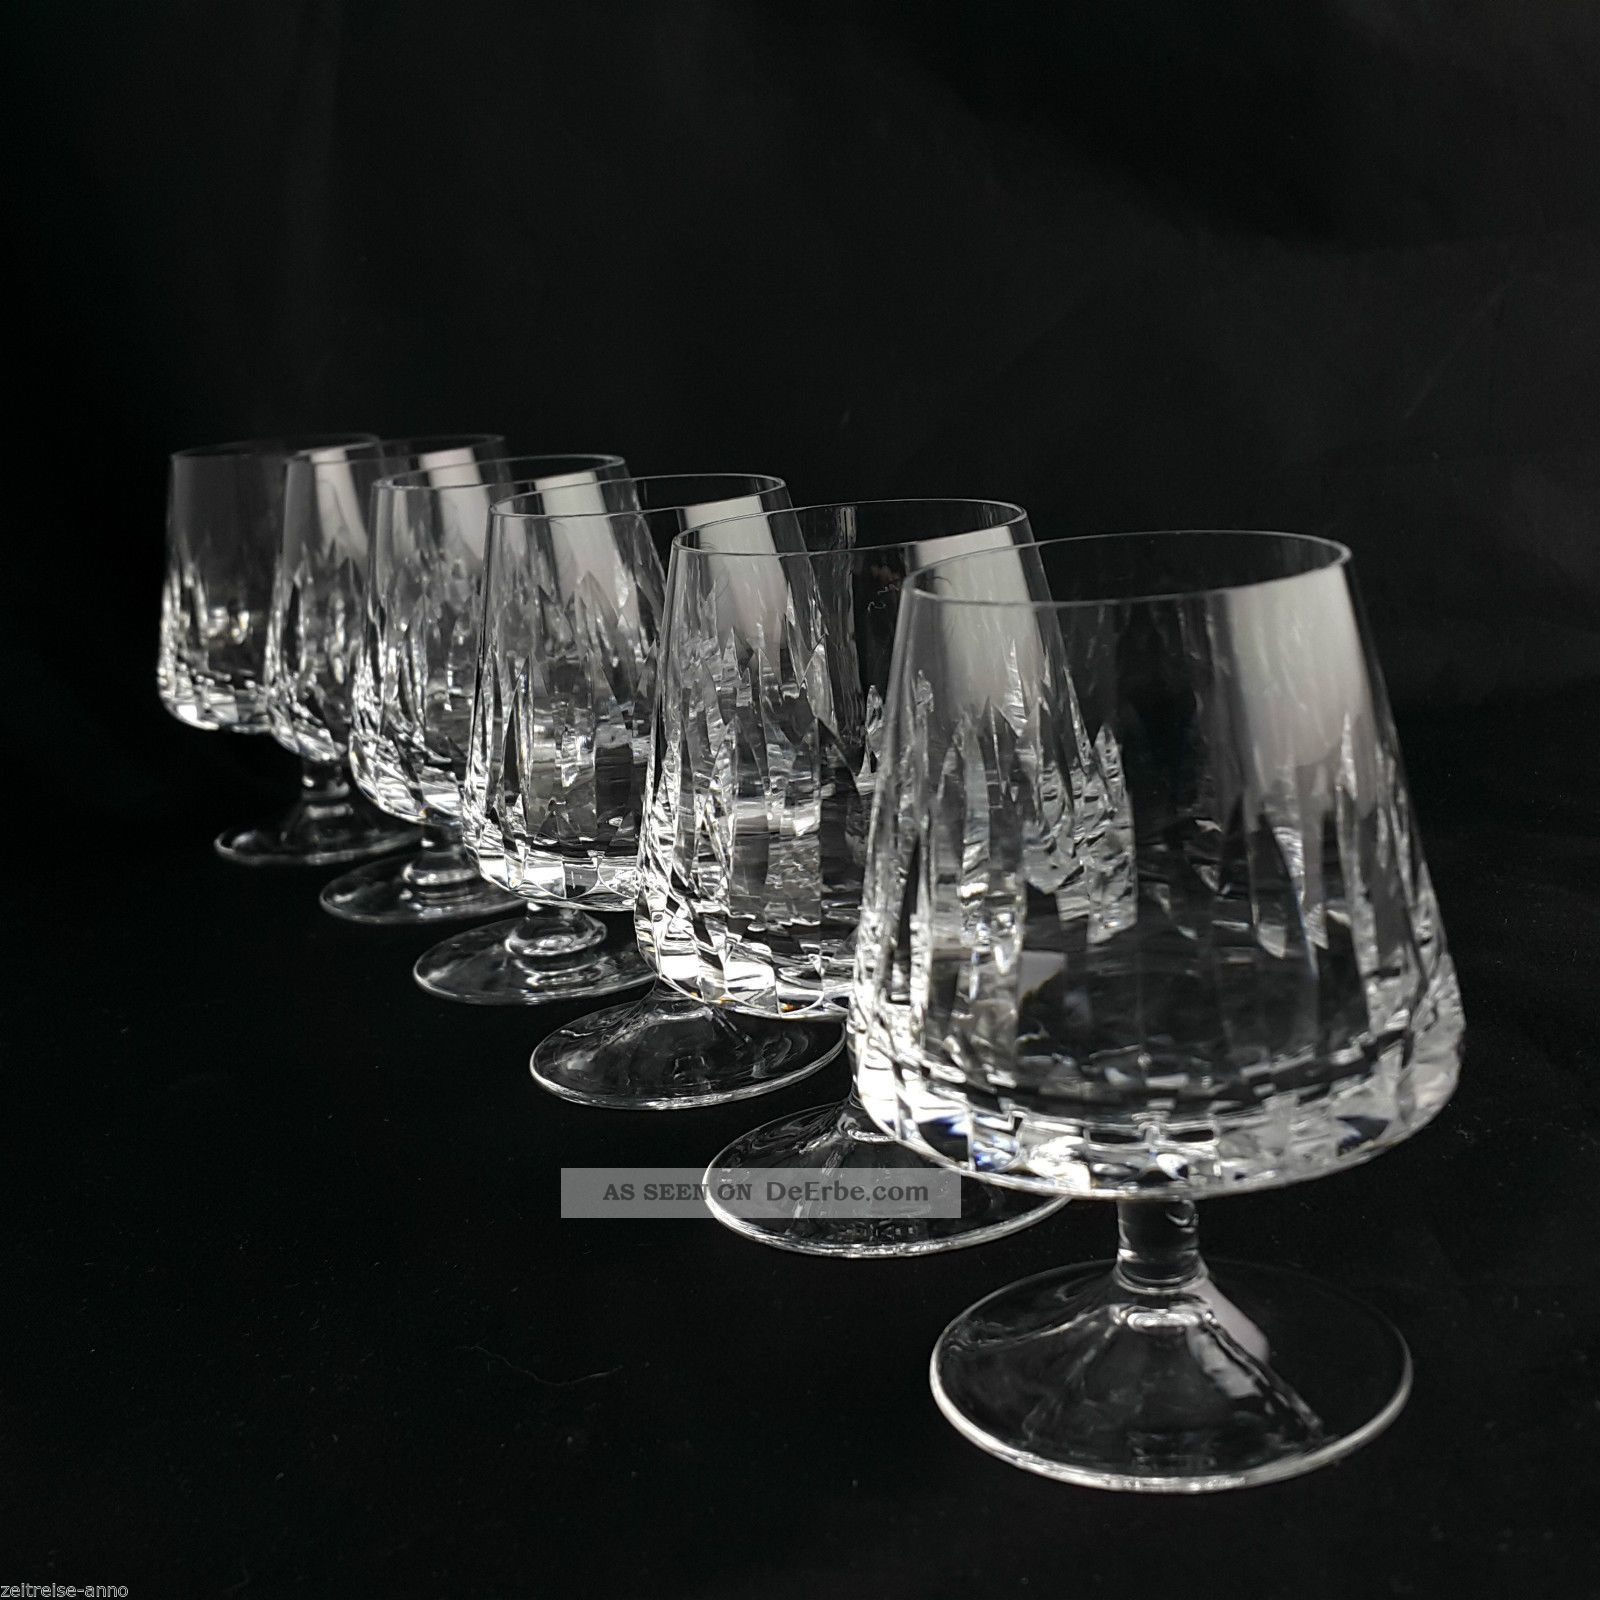 Nachtmann Cognacgläser Helena 6 Vintage Kristall Gläser Toll Erhalten Kristall Bild